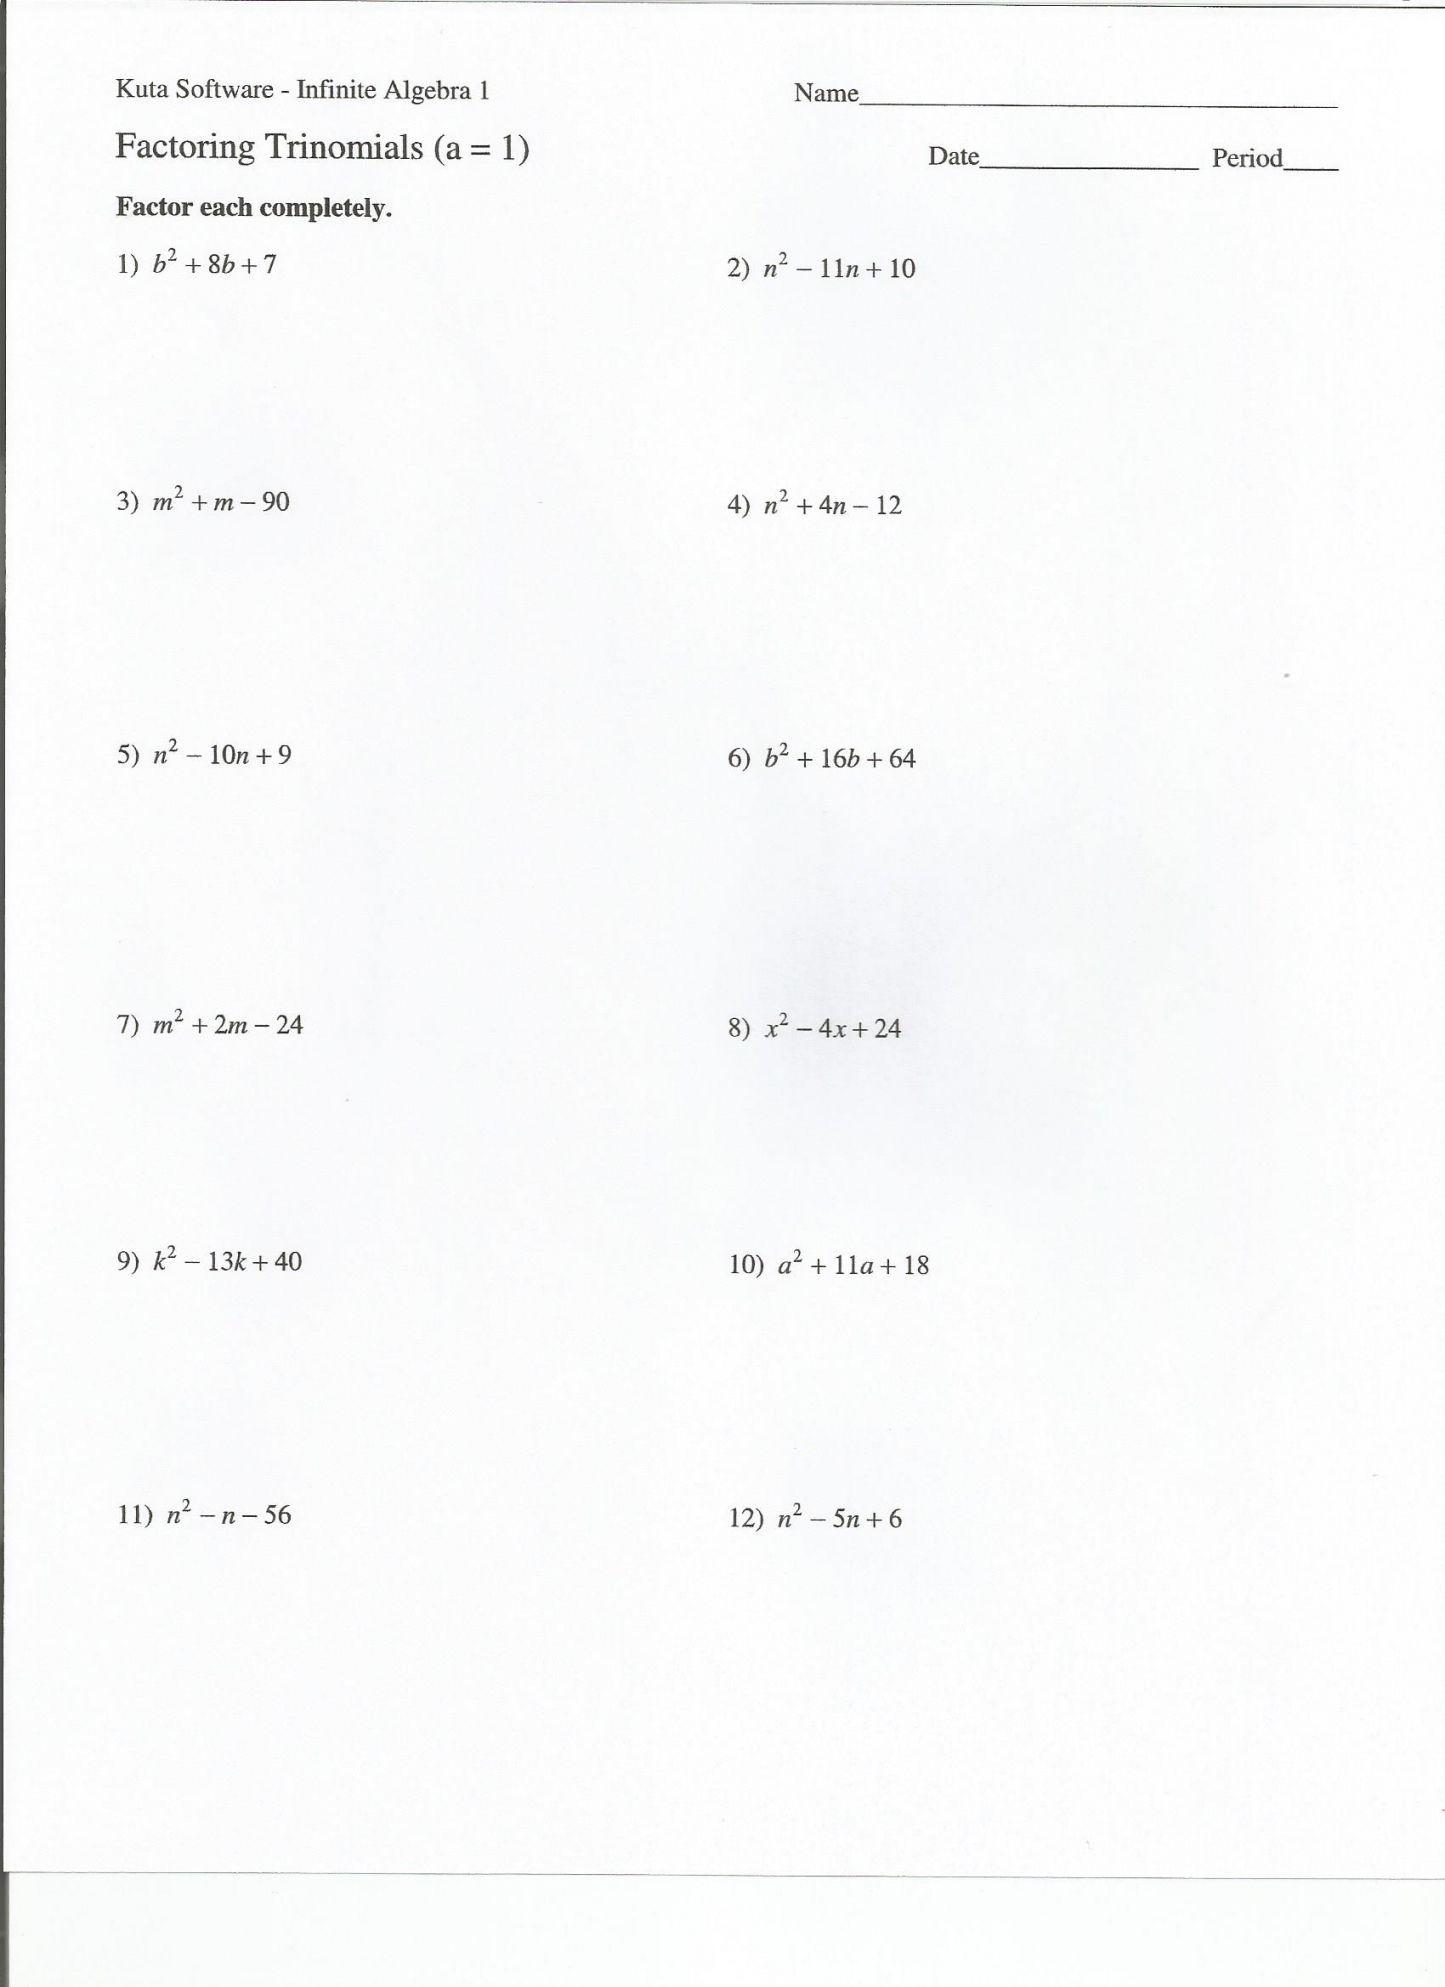 Factoring Trinomials A 1 Worksheet Factoring Trinomials X2 Bx C Worksheet